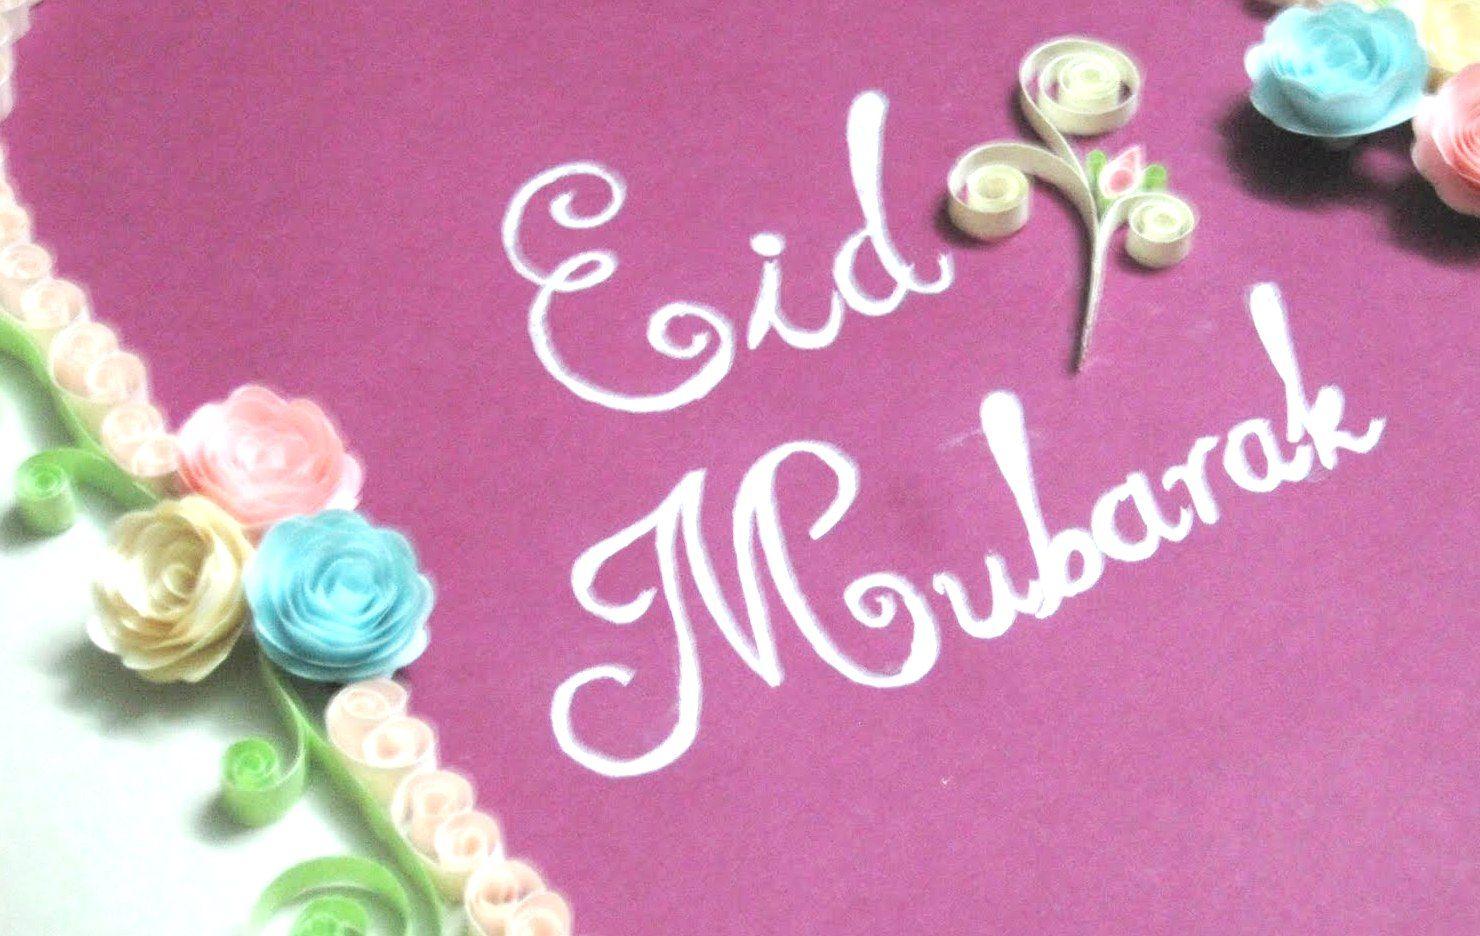 Eid 2013 pictures latest beautiful eid mubarak wallpapers eid eid 2013 pictures latest beautiful eid mubarak wallpapers eid mubarak pictures 2013 kristyandbryce Choice Image